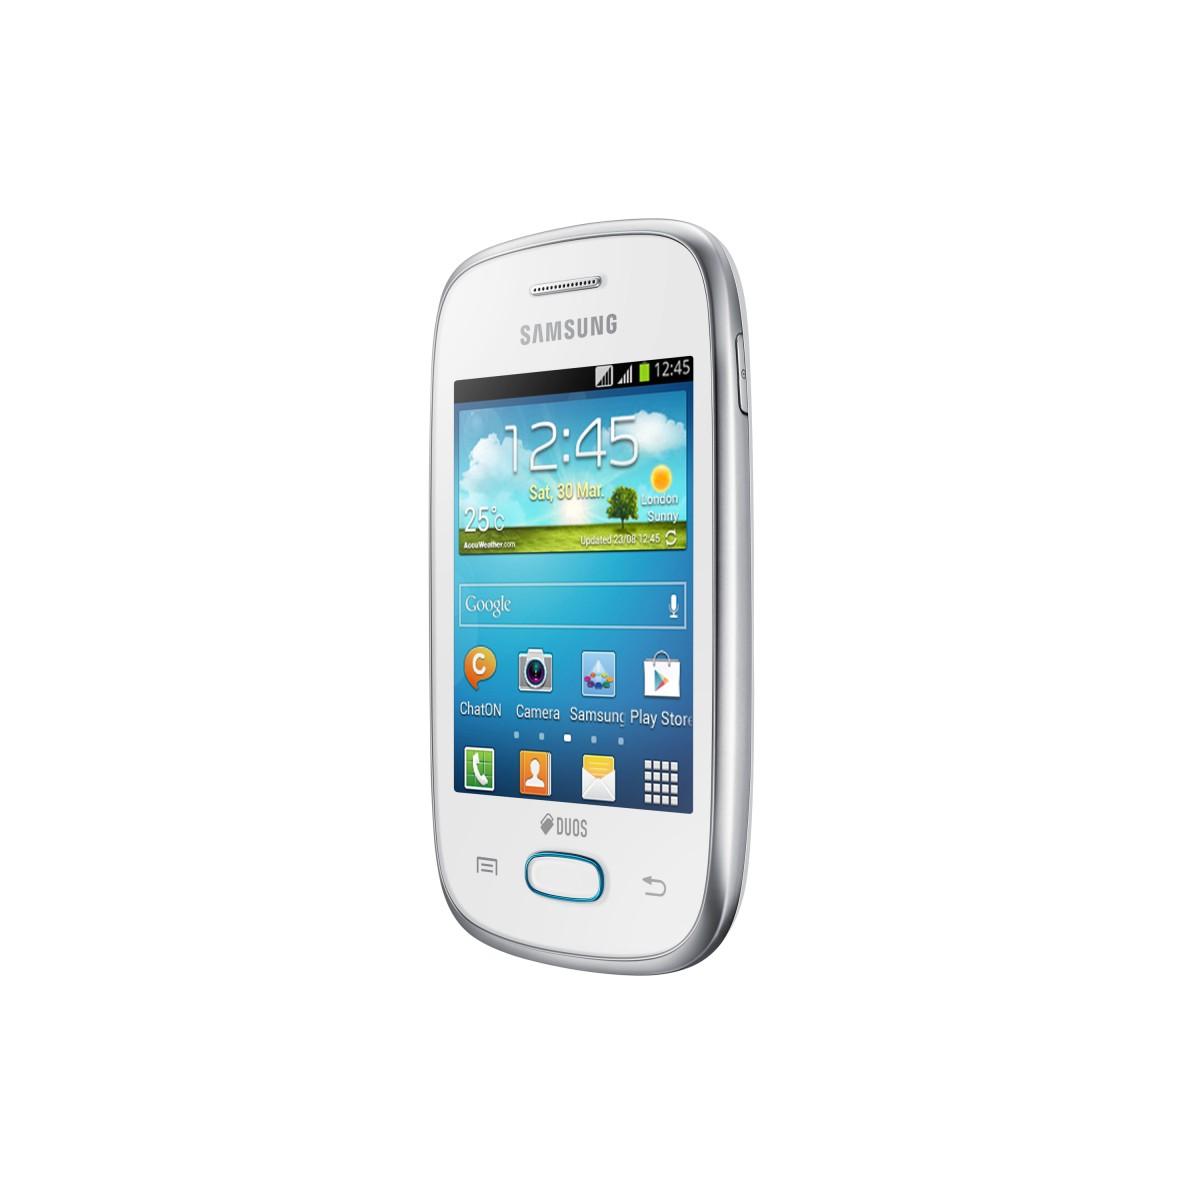 Smartphone Desbloqueado Samsung Galaxy Pocket Neo Duos GT-S5312B Branco, Camera 2MP, Wi-fi, 3G, GPS, Android 4.1 - Samsu